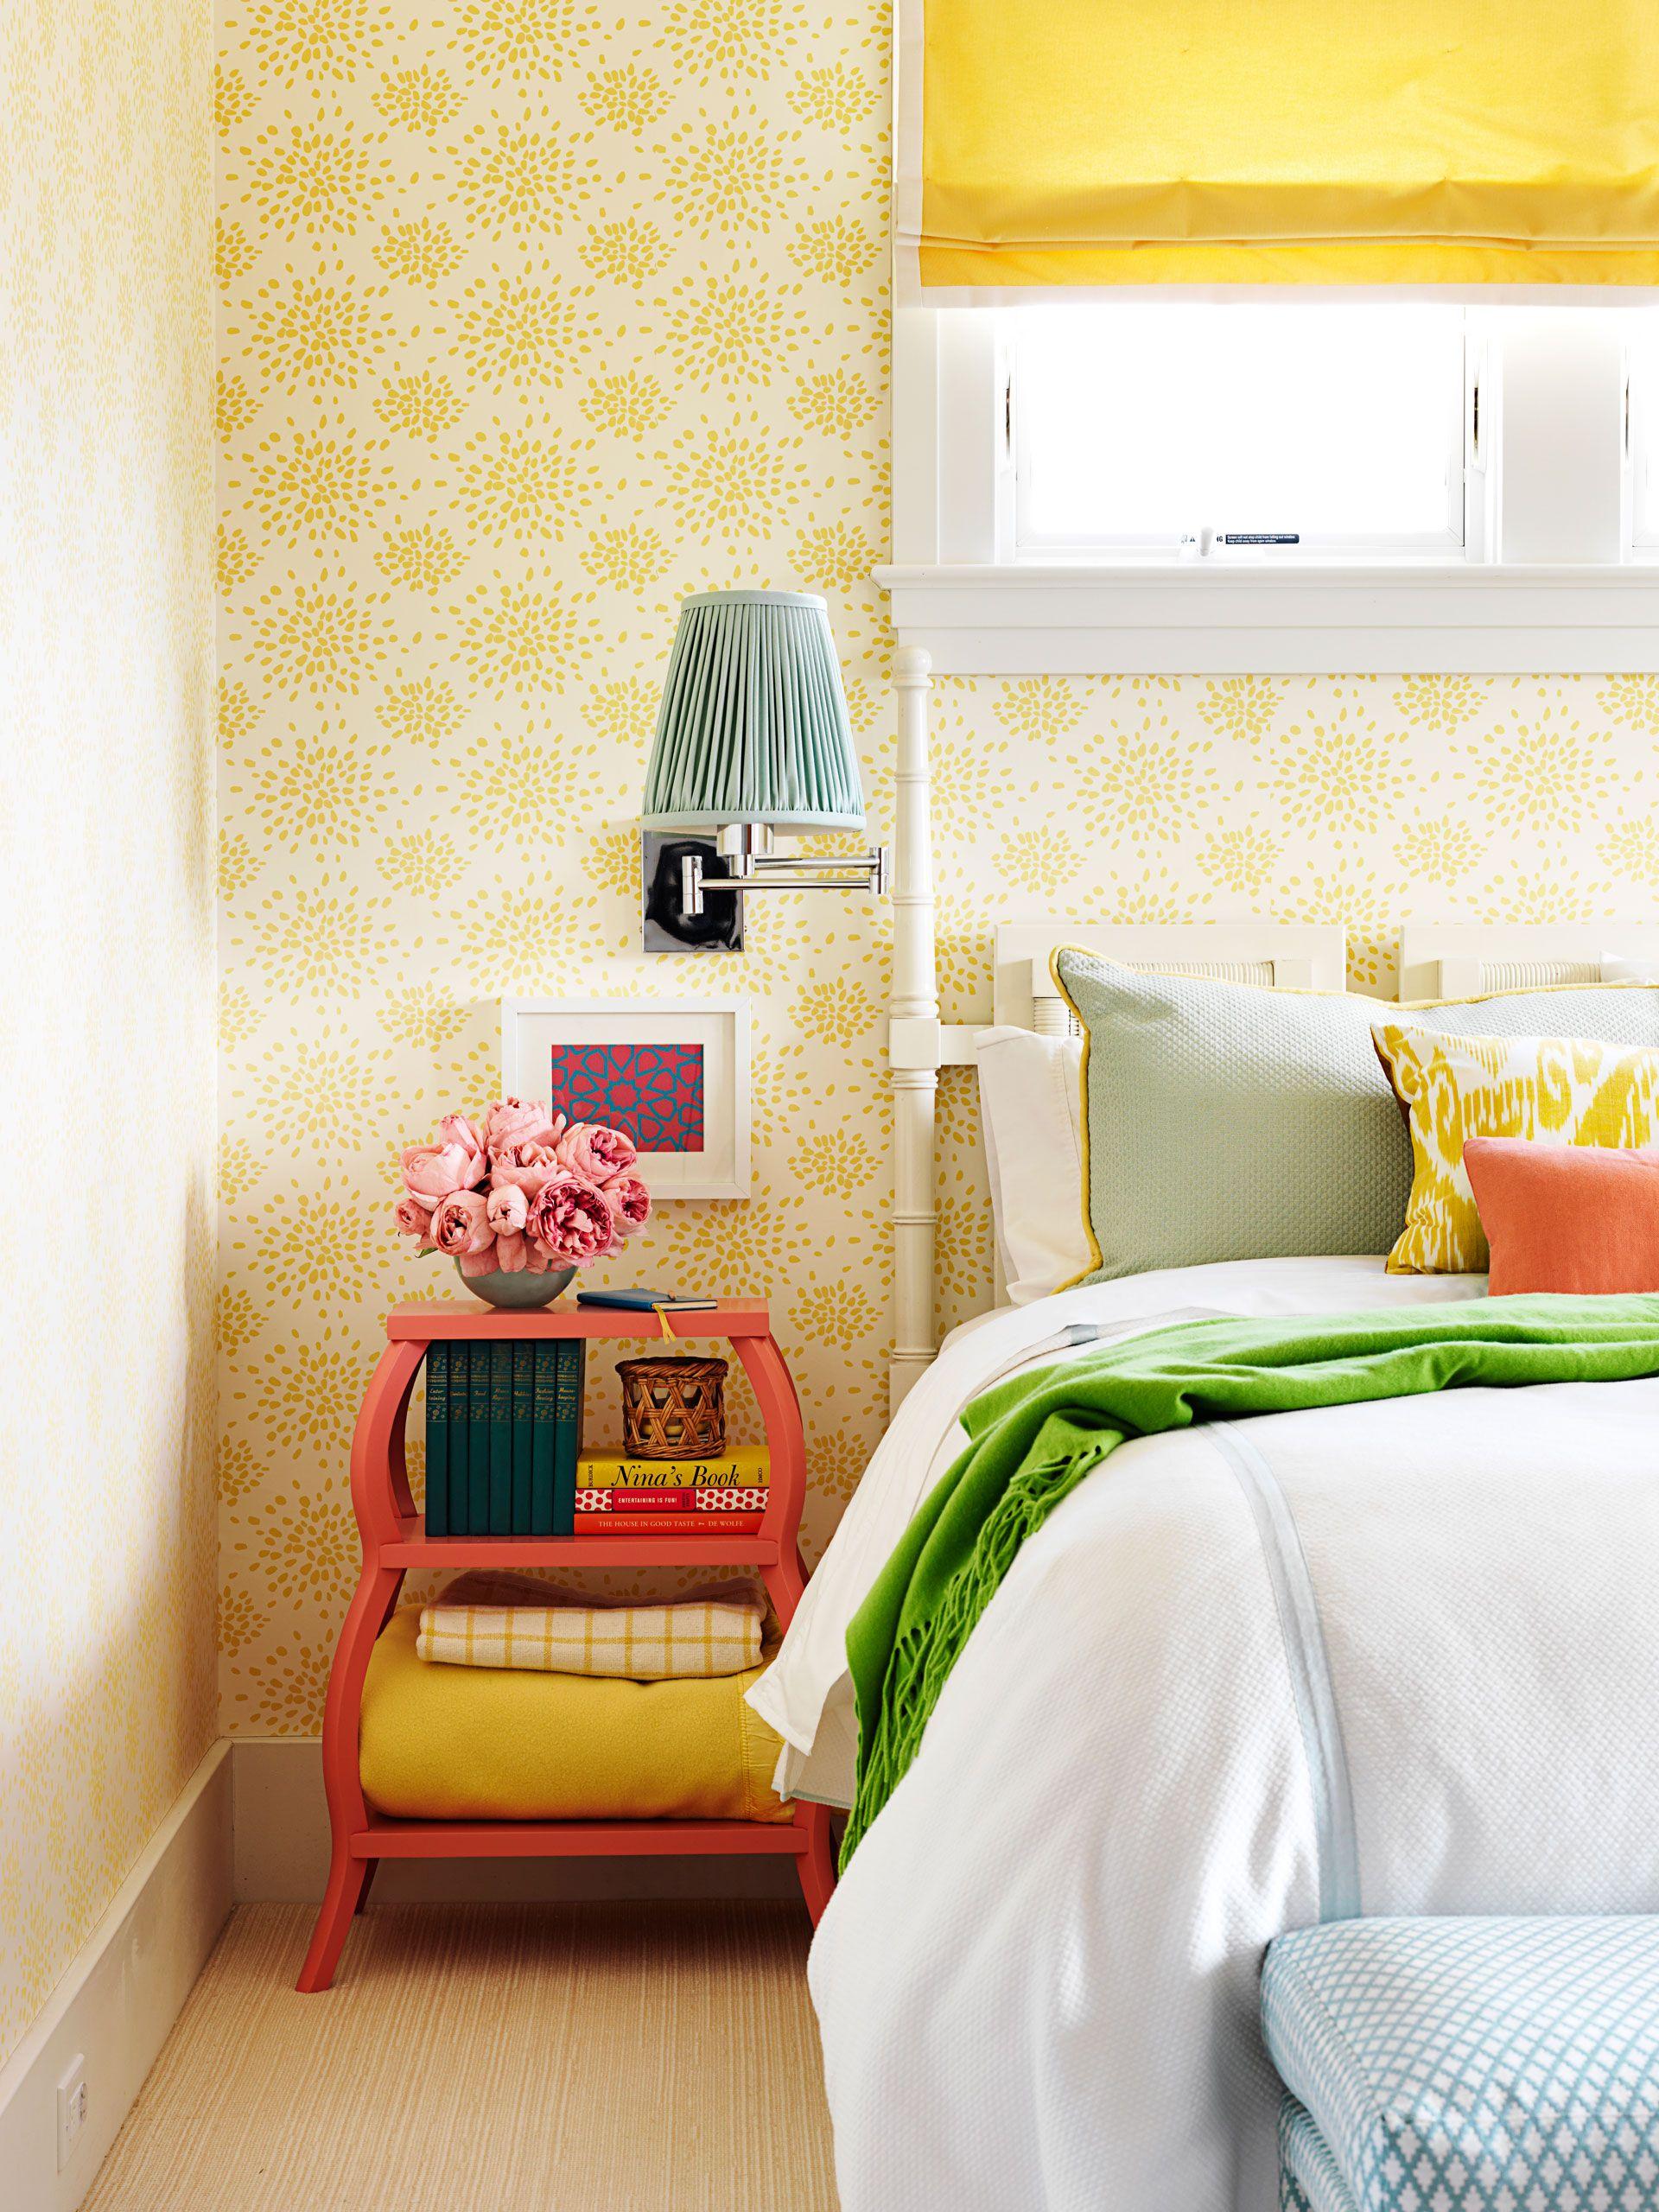 Guest Bedroom Decor Ideas - Guest Room Essentials